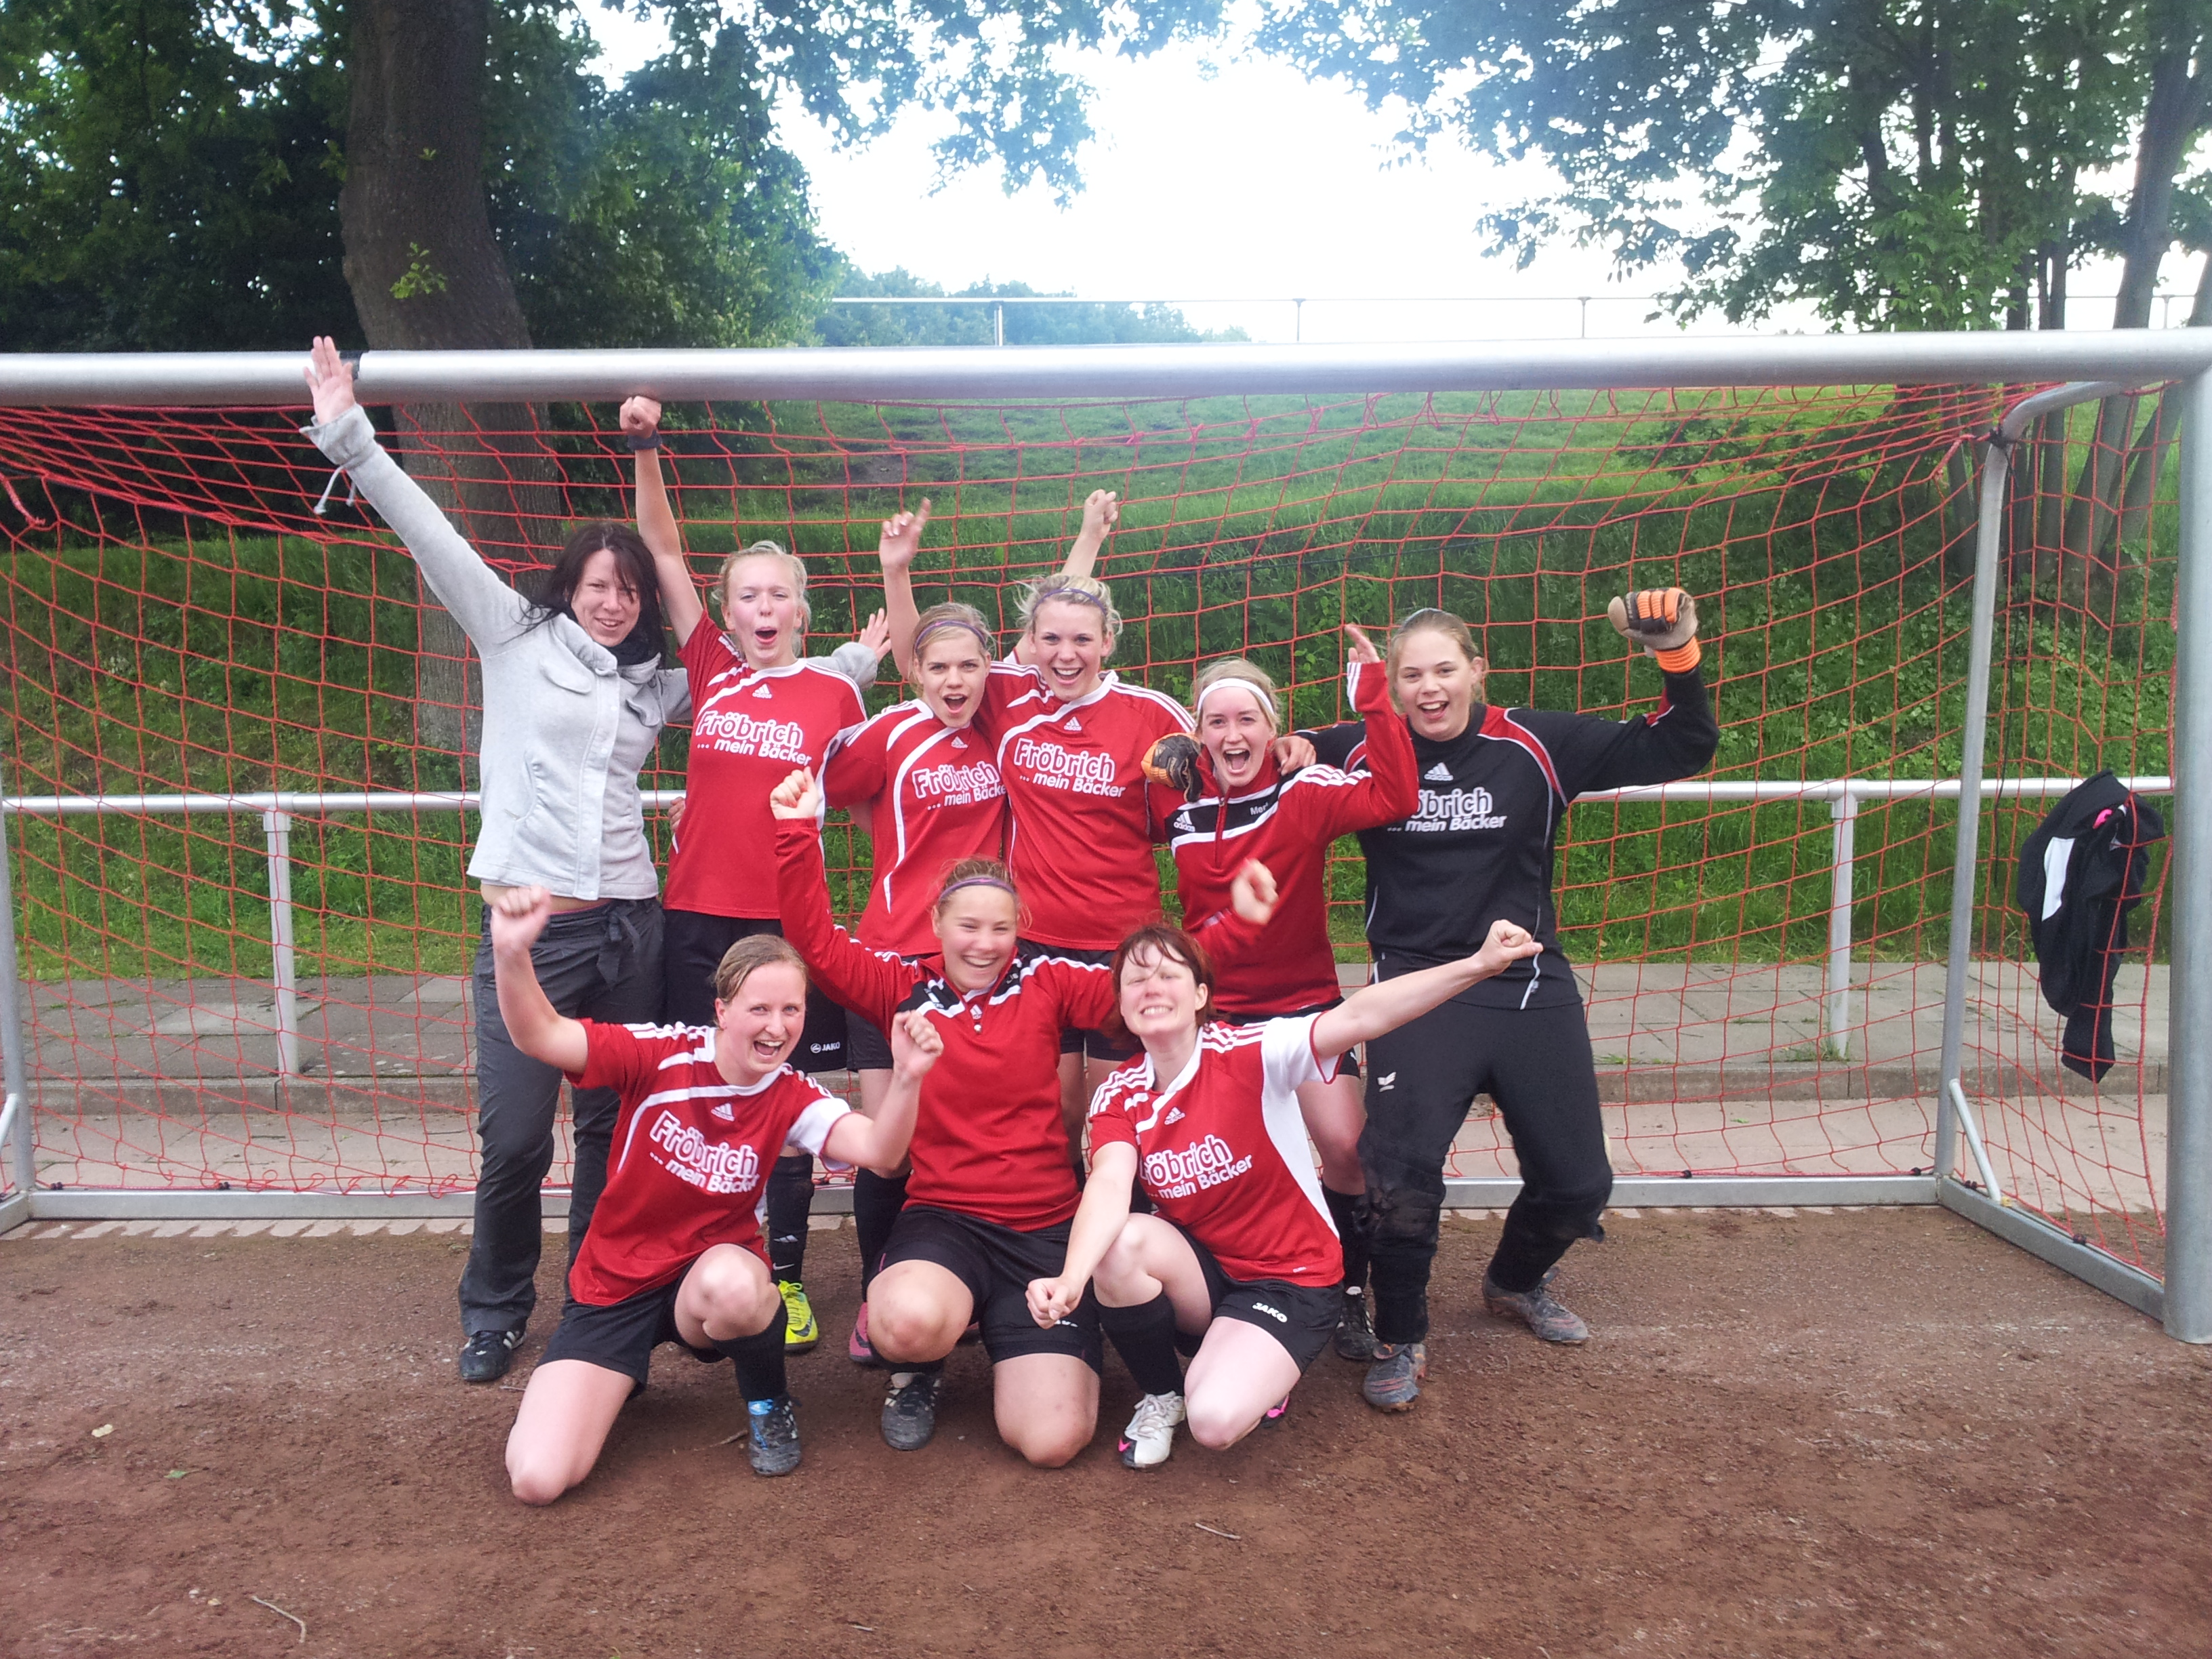 Zweite Damenmannschaft ebenfalls Meister – Grandioser 7:0 Sieg gegen Blomberg